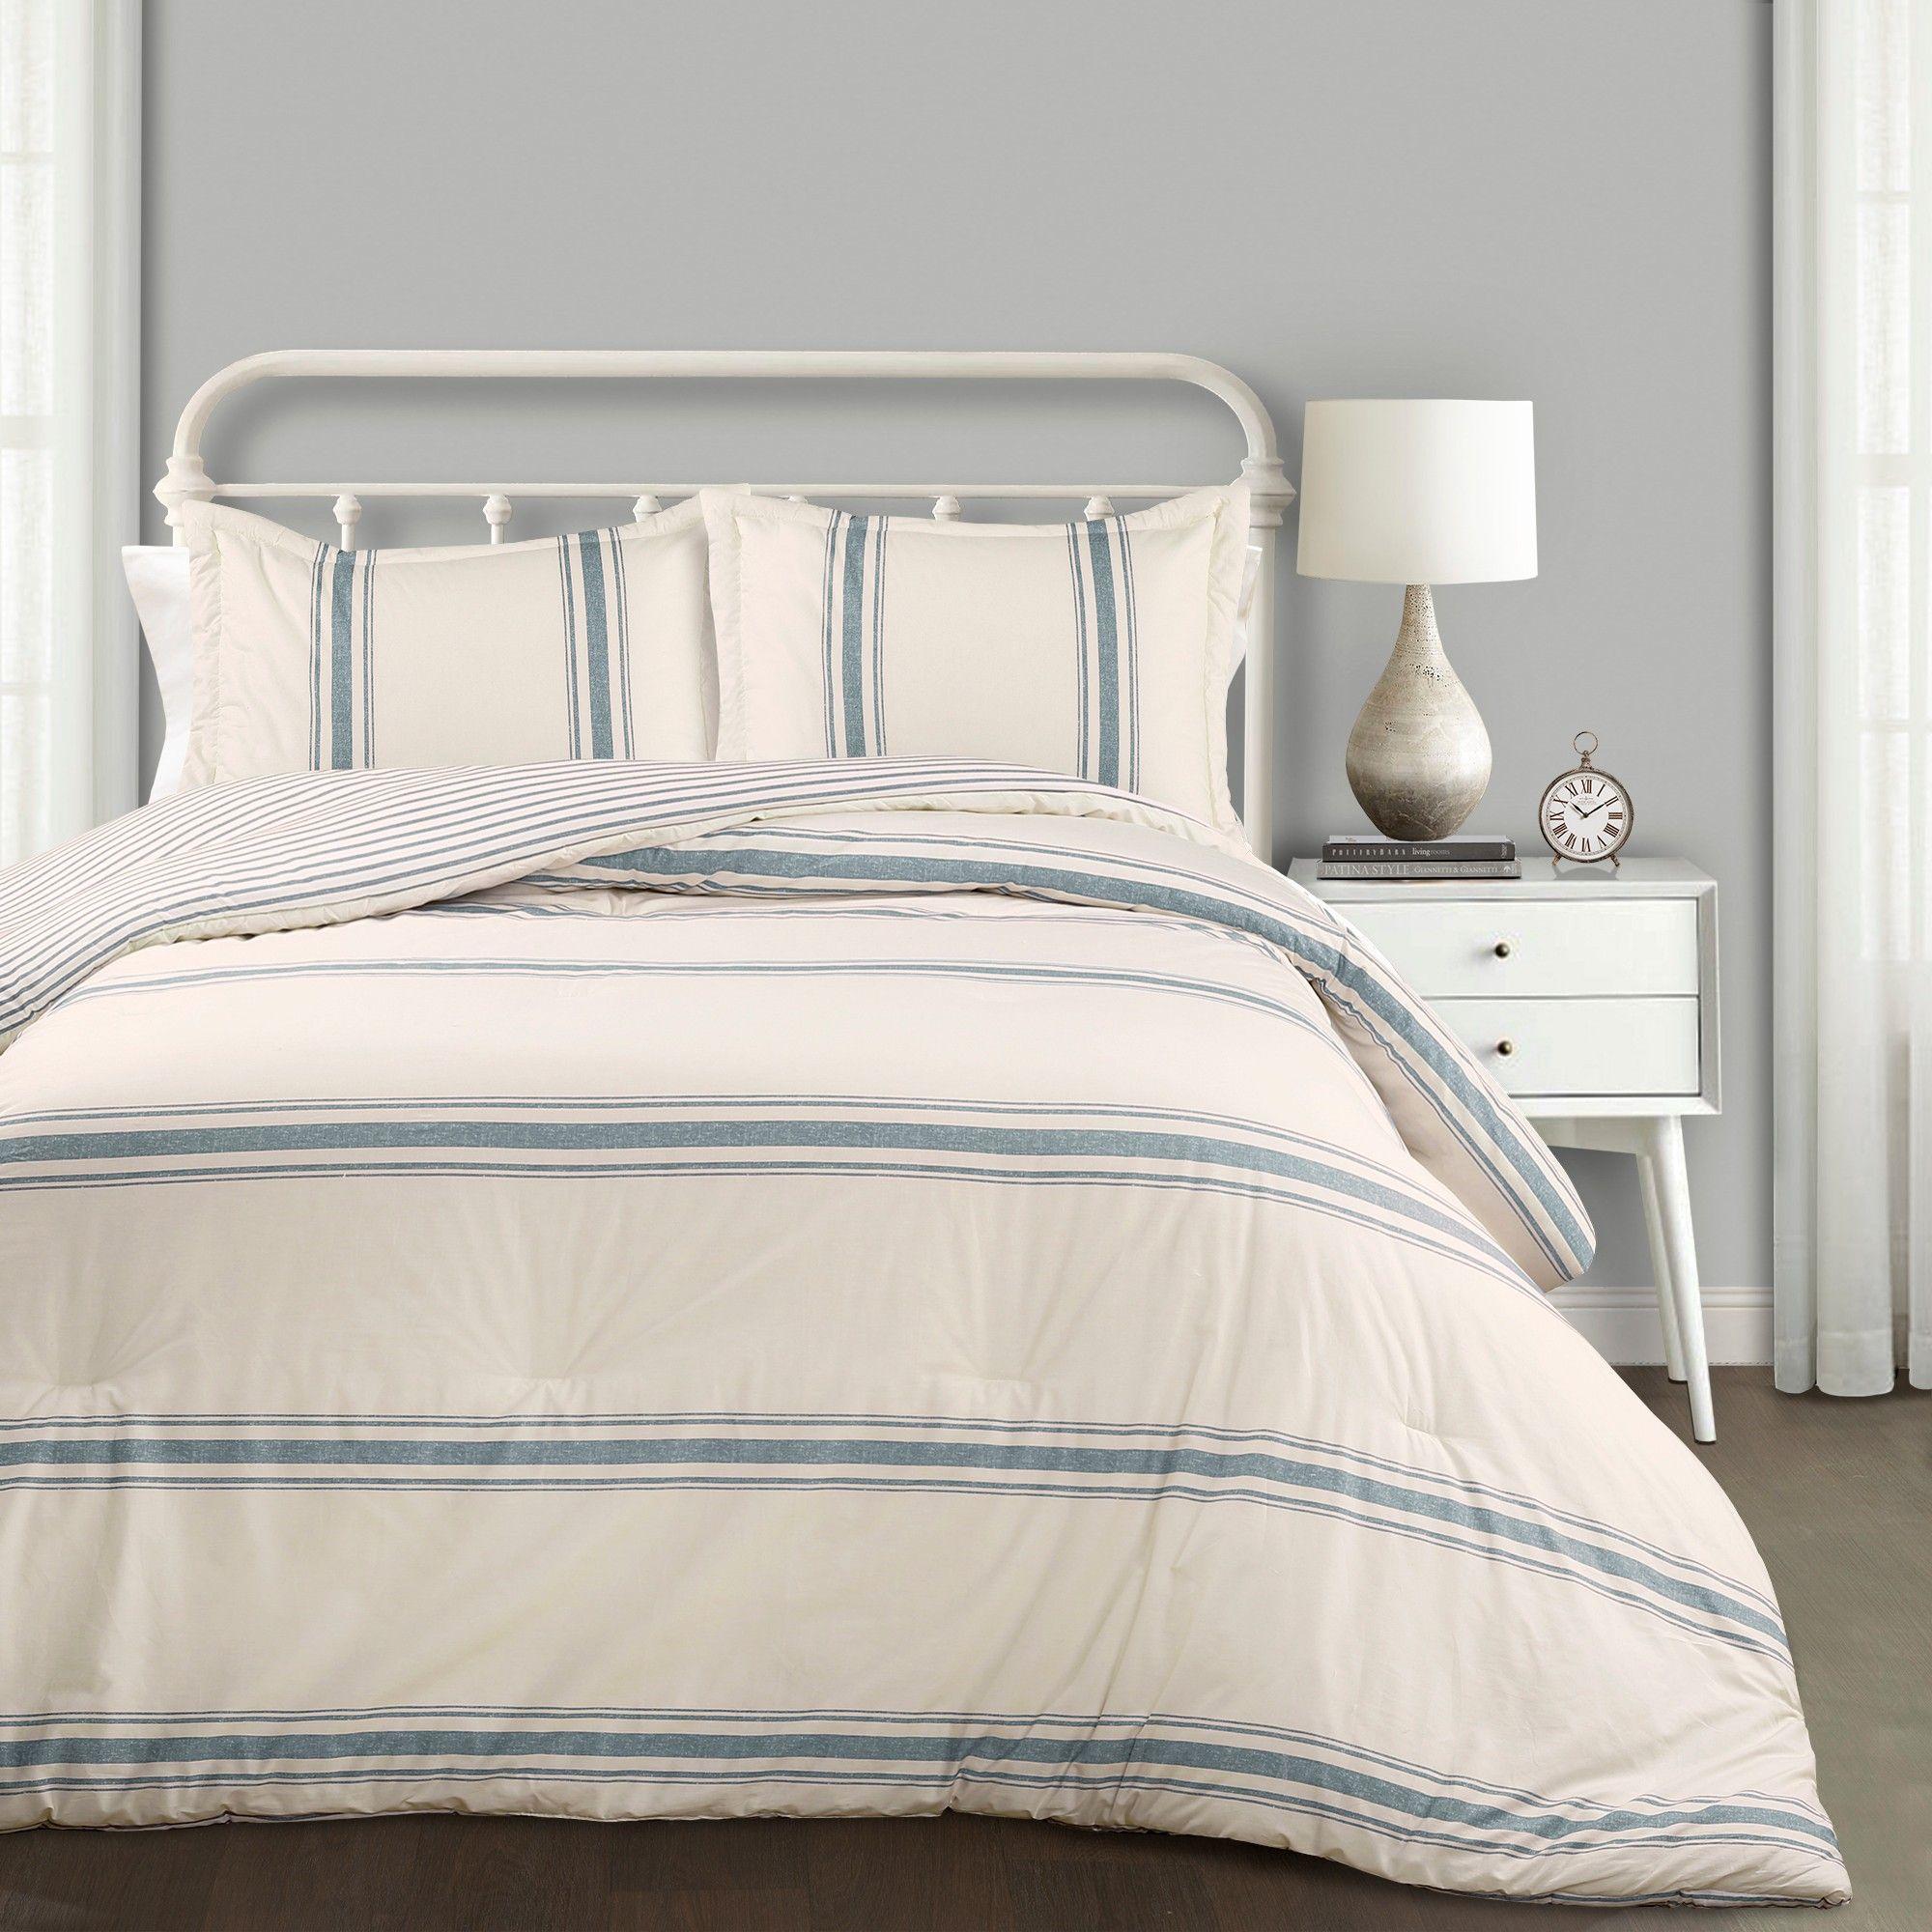 3pc Full/Queen Farmhouse Stripe Comforter Set Blue Lush